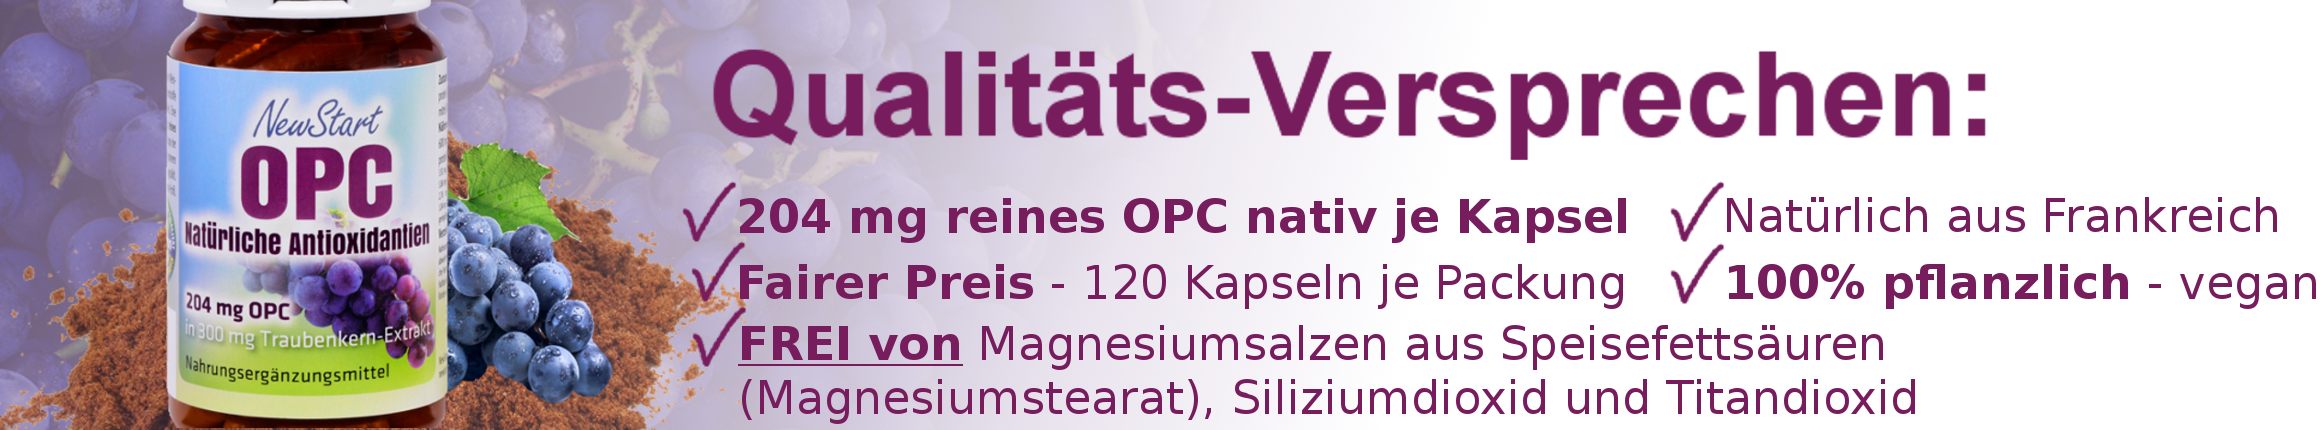 OPC-Banner-Unterkategorie589438aa7c1e6